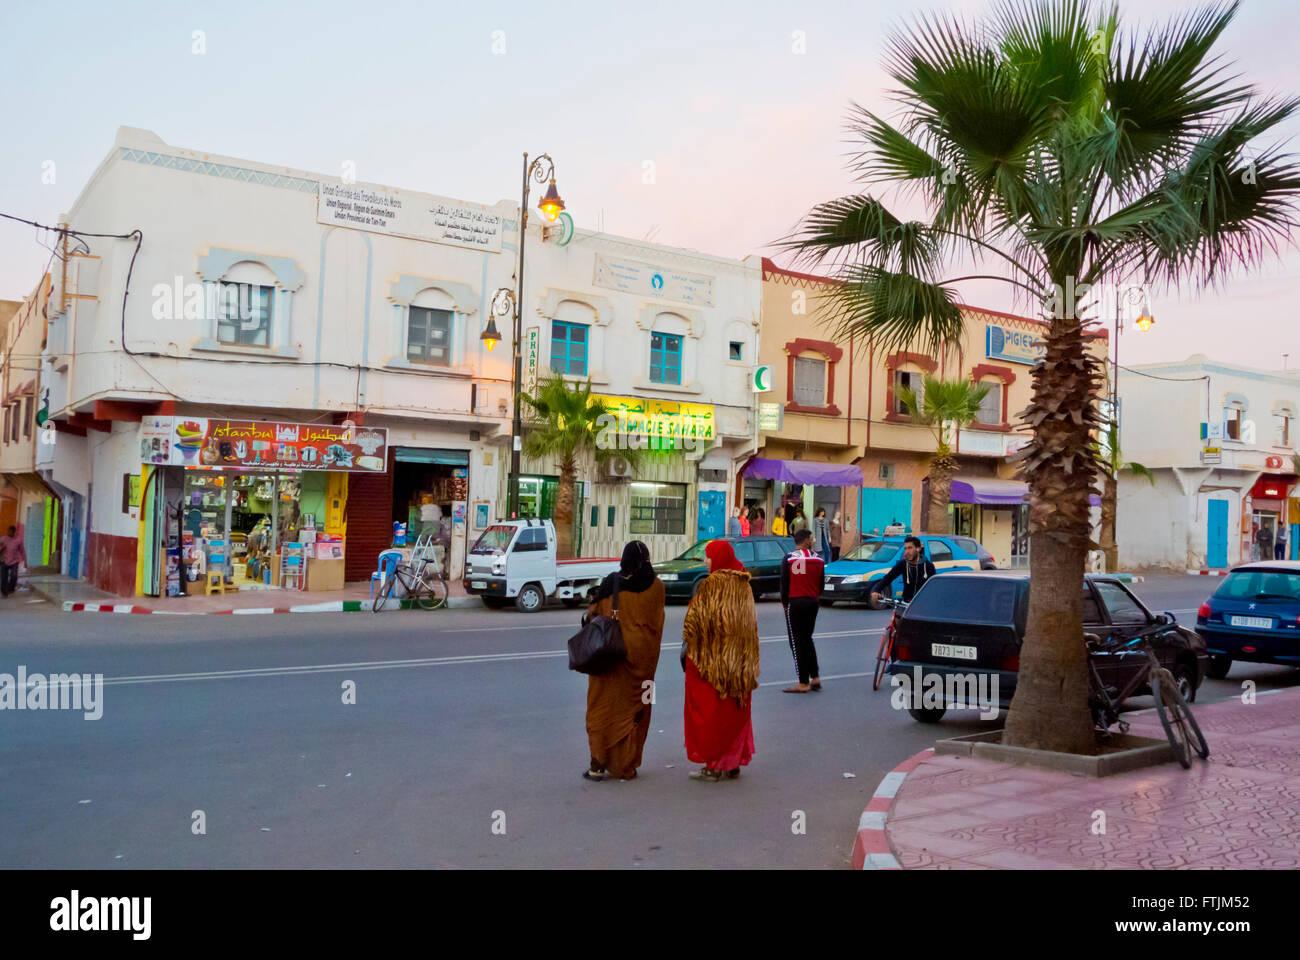 Boulevard Hassan II, Tan Tan, southern Morocco, northern Africa - Stock Image